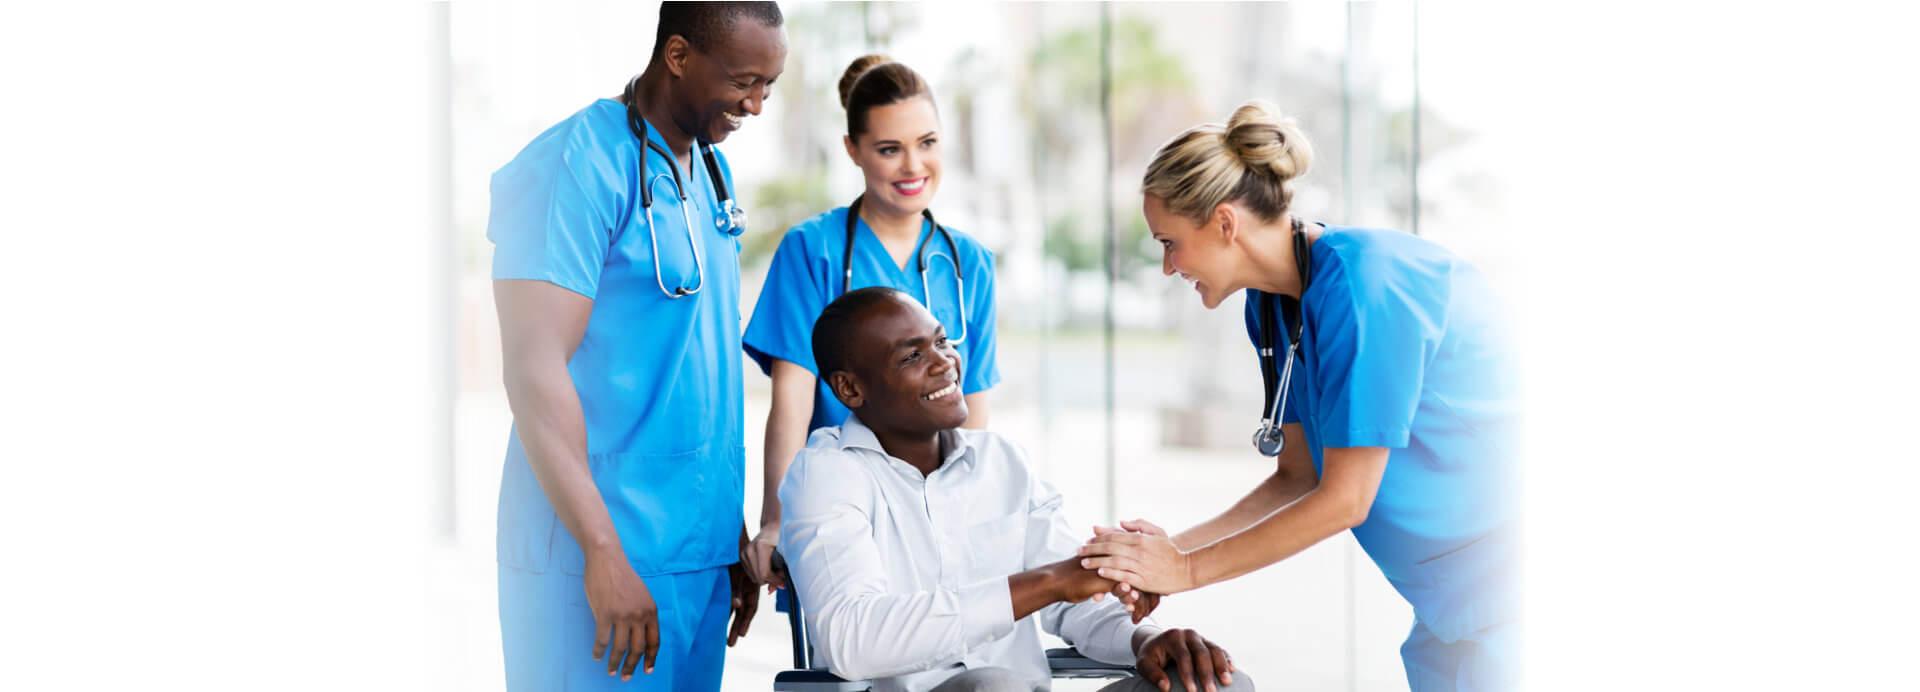 black man asisted by nurses